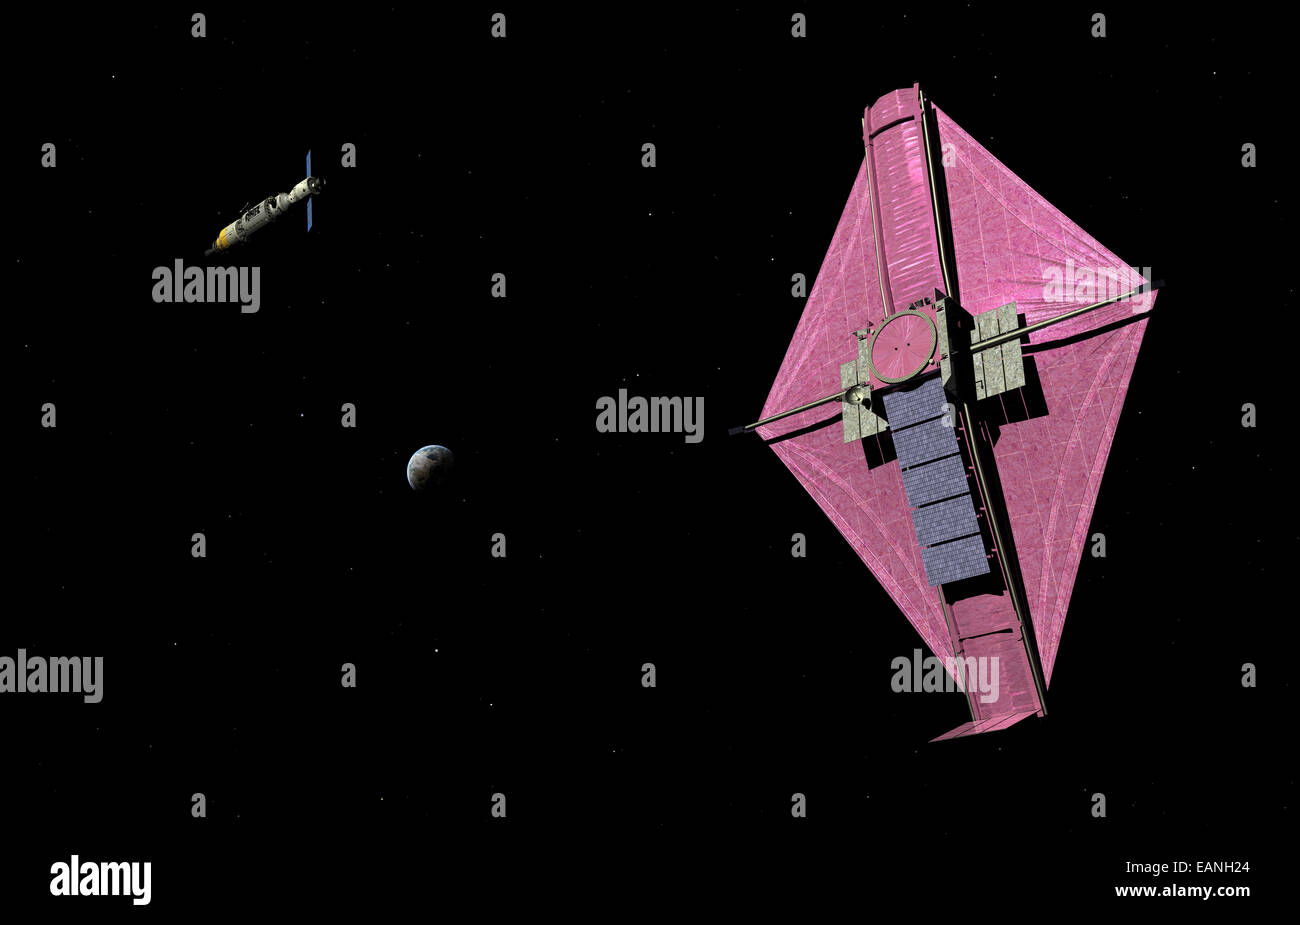 A manned orbital maintenance platform (OMP) approaches NASA's James Webb Space Telescope (JWST). The James Webb Stock Photo